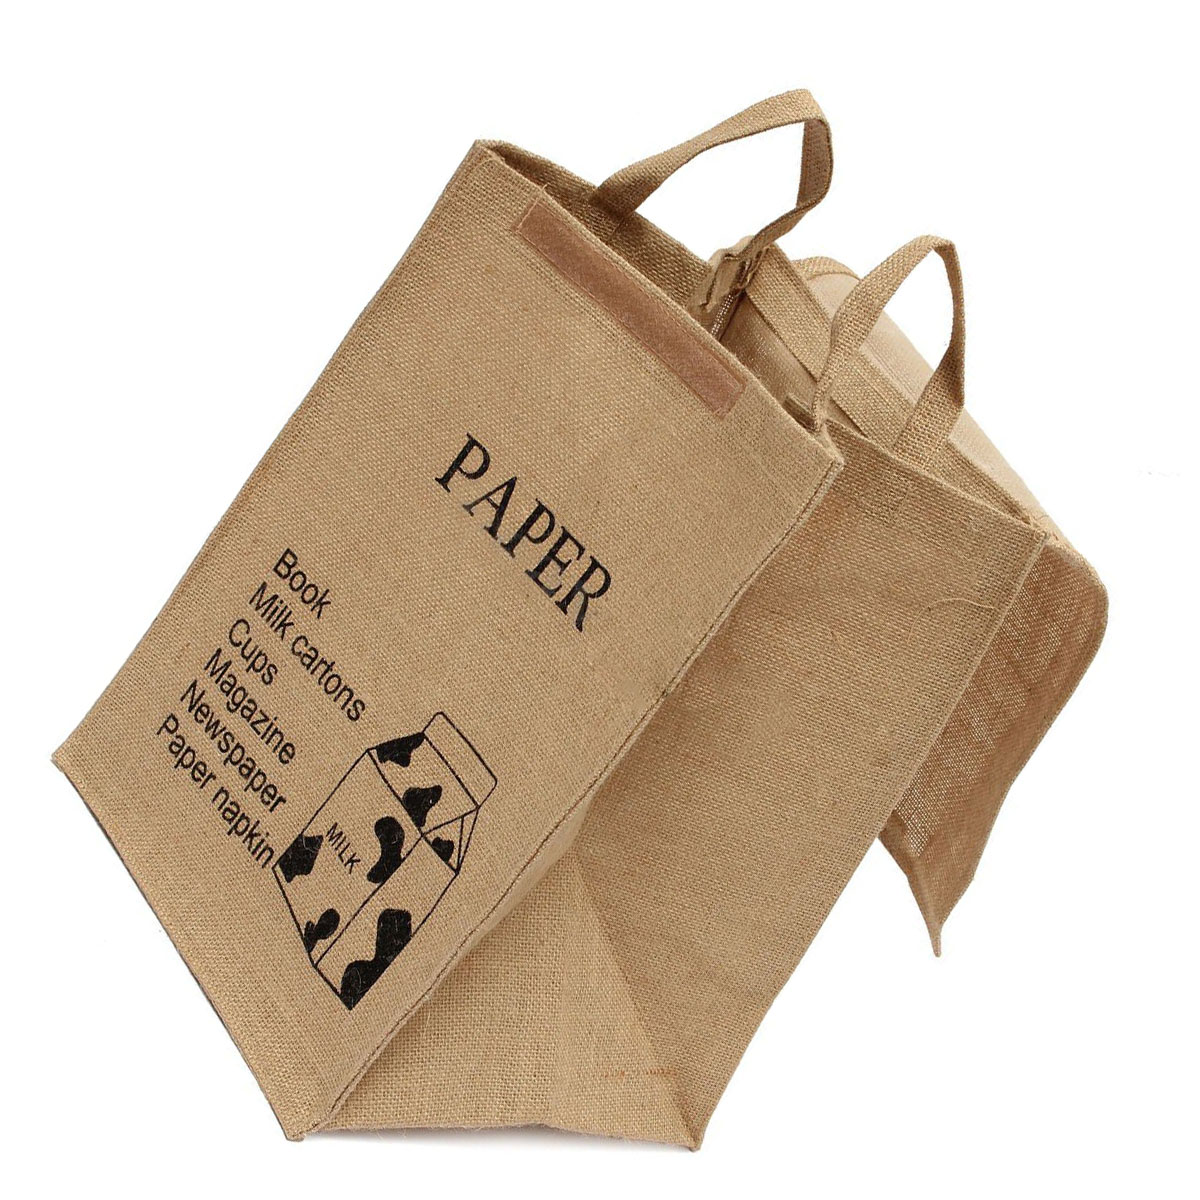 NOCM-Large Cotton Linen Folding Laundry Washing Clothe Basket Bag Bin Storage Hamper(Milk box Pattern)